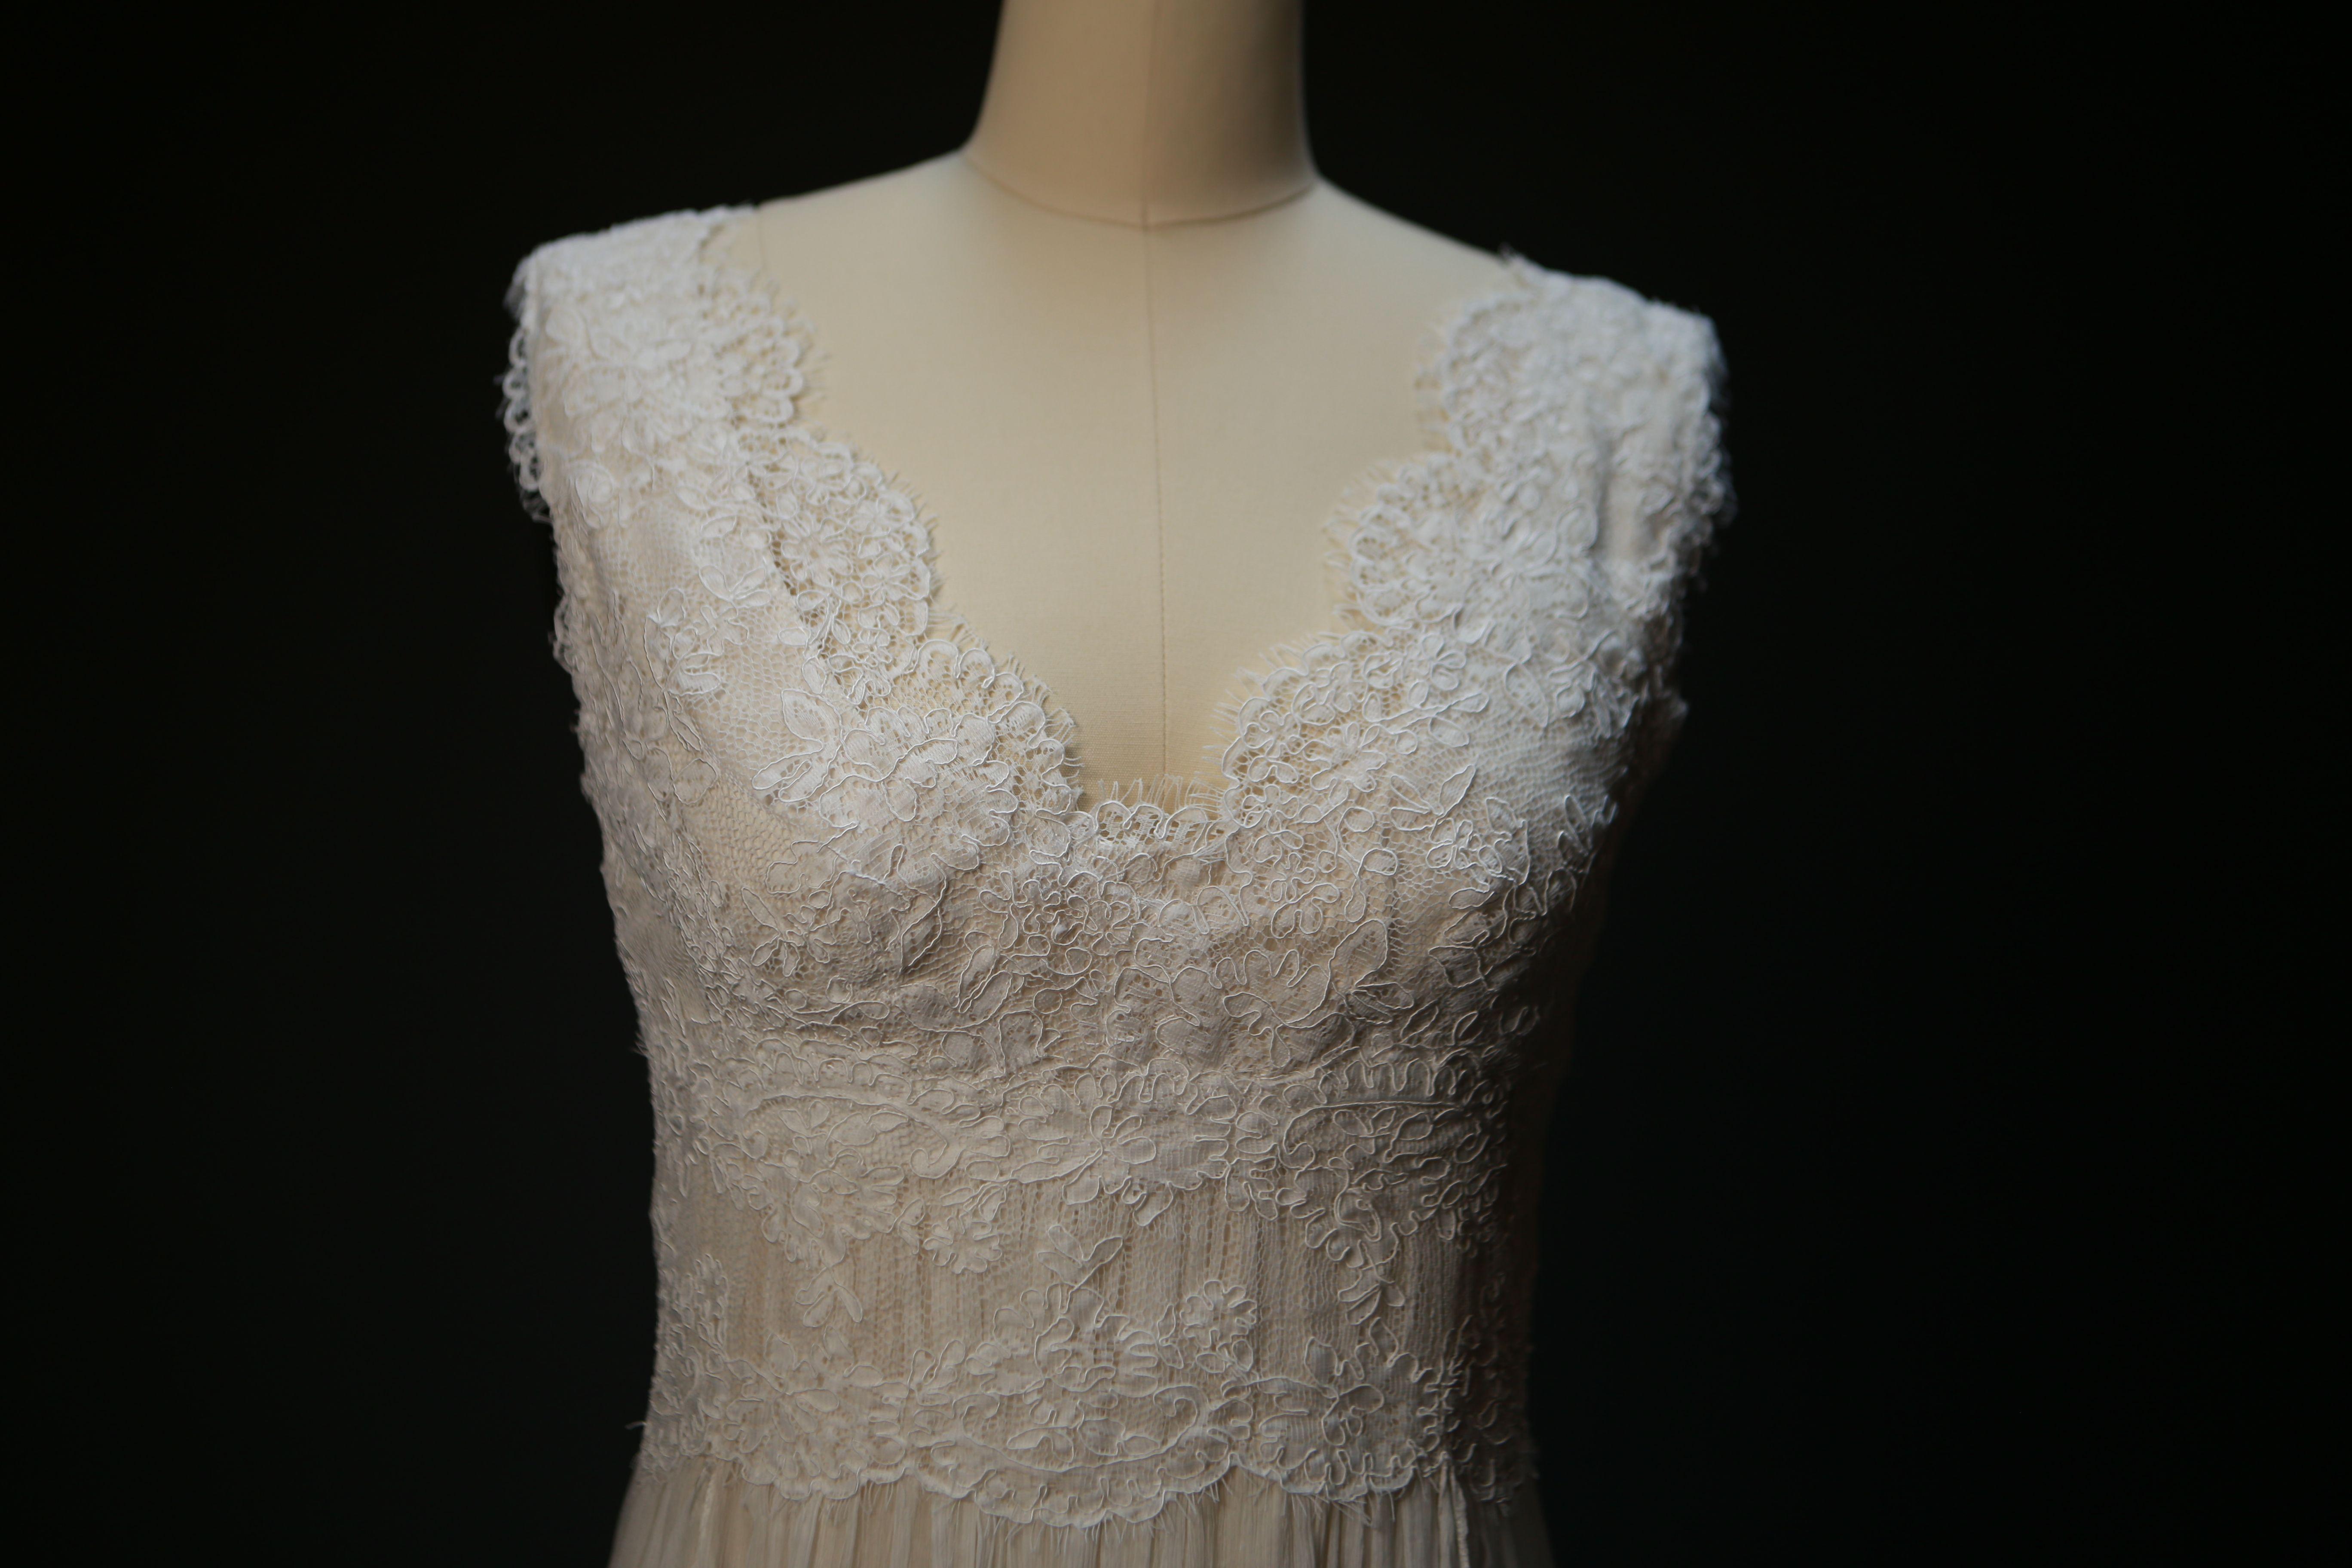 On airy handkerchief skirt lace wedding dress in saja